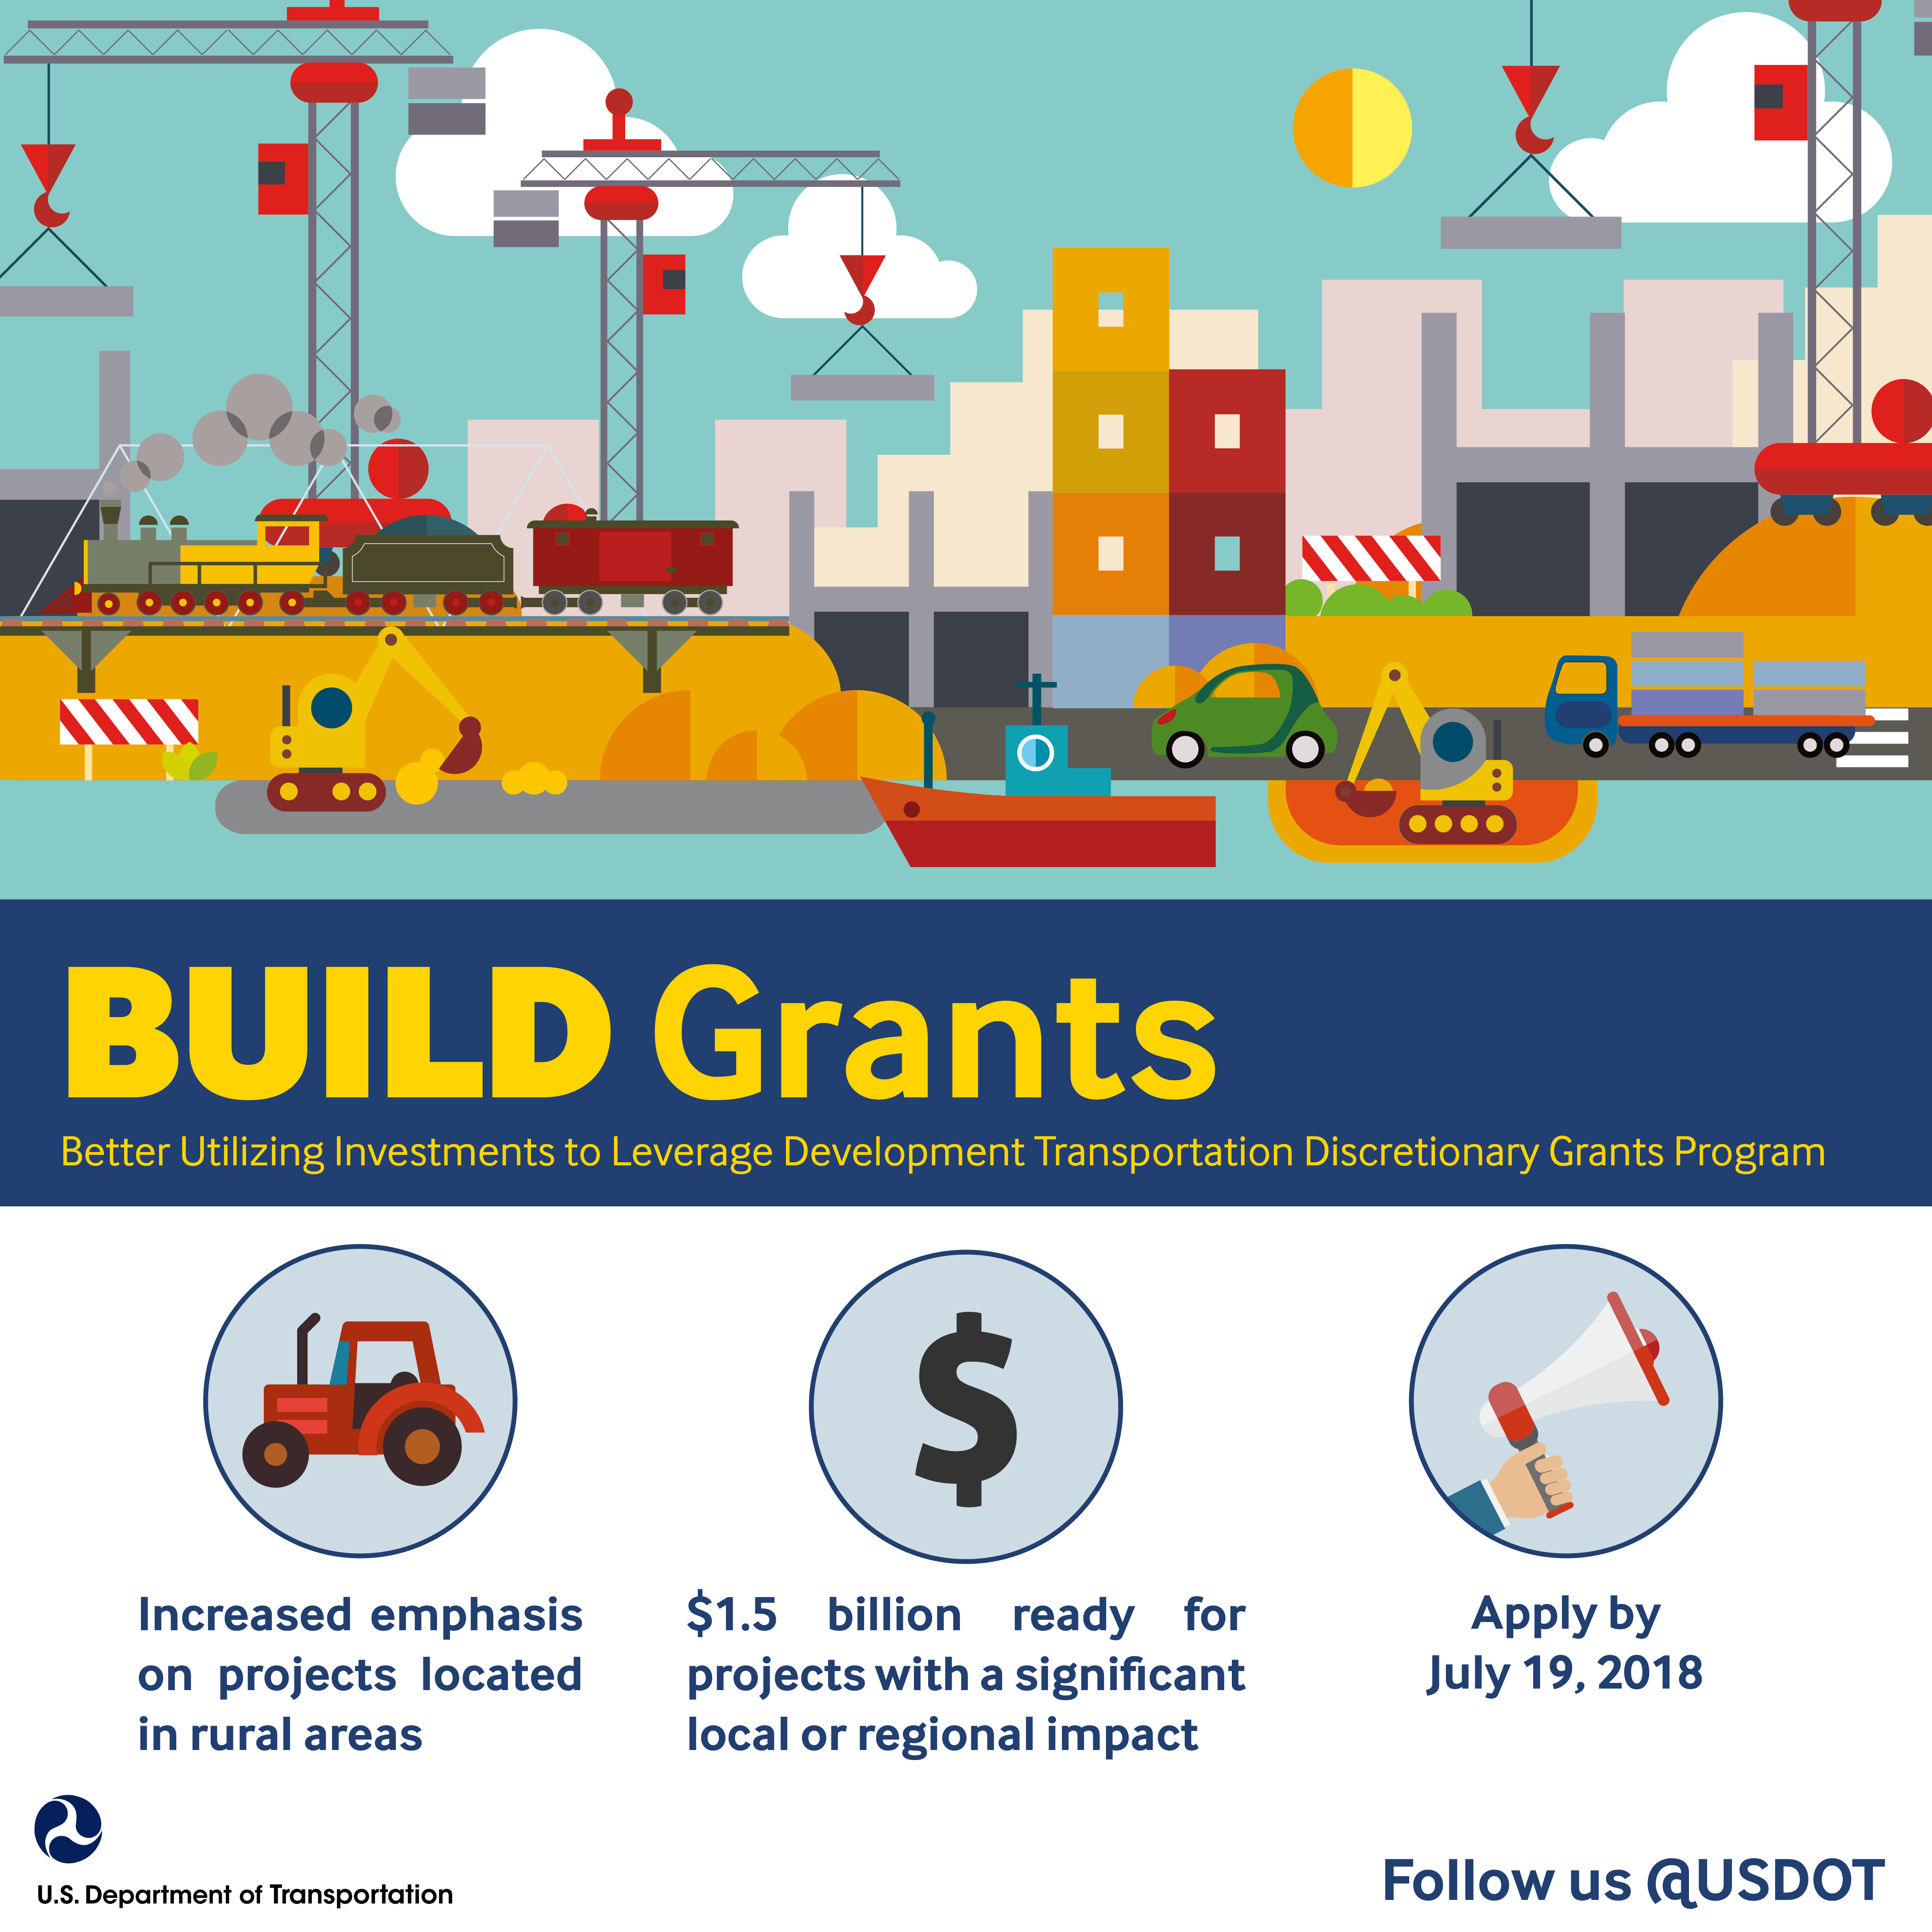 BUILD Grants